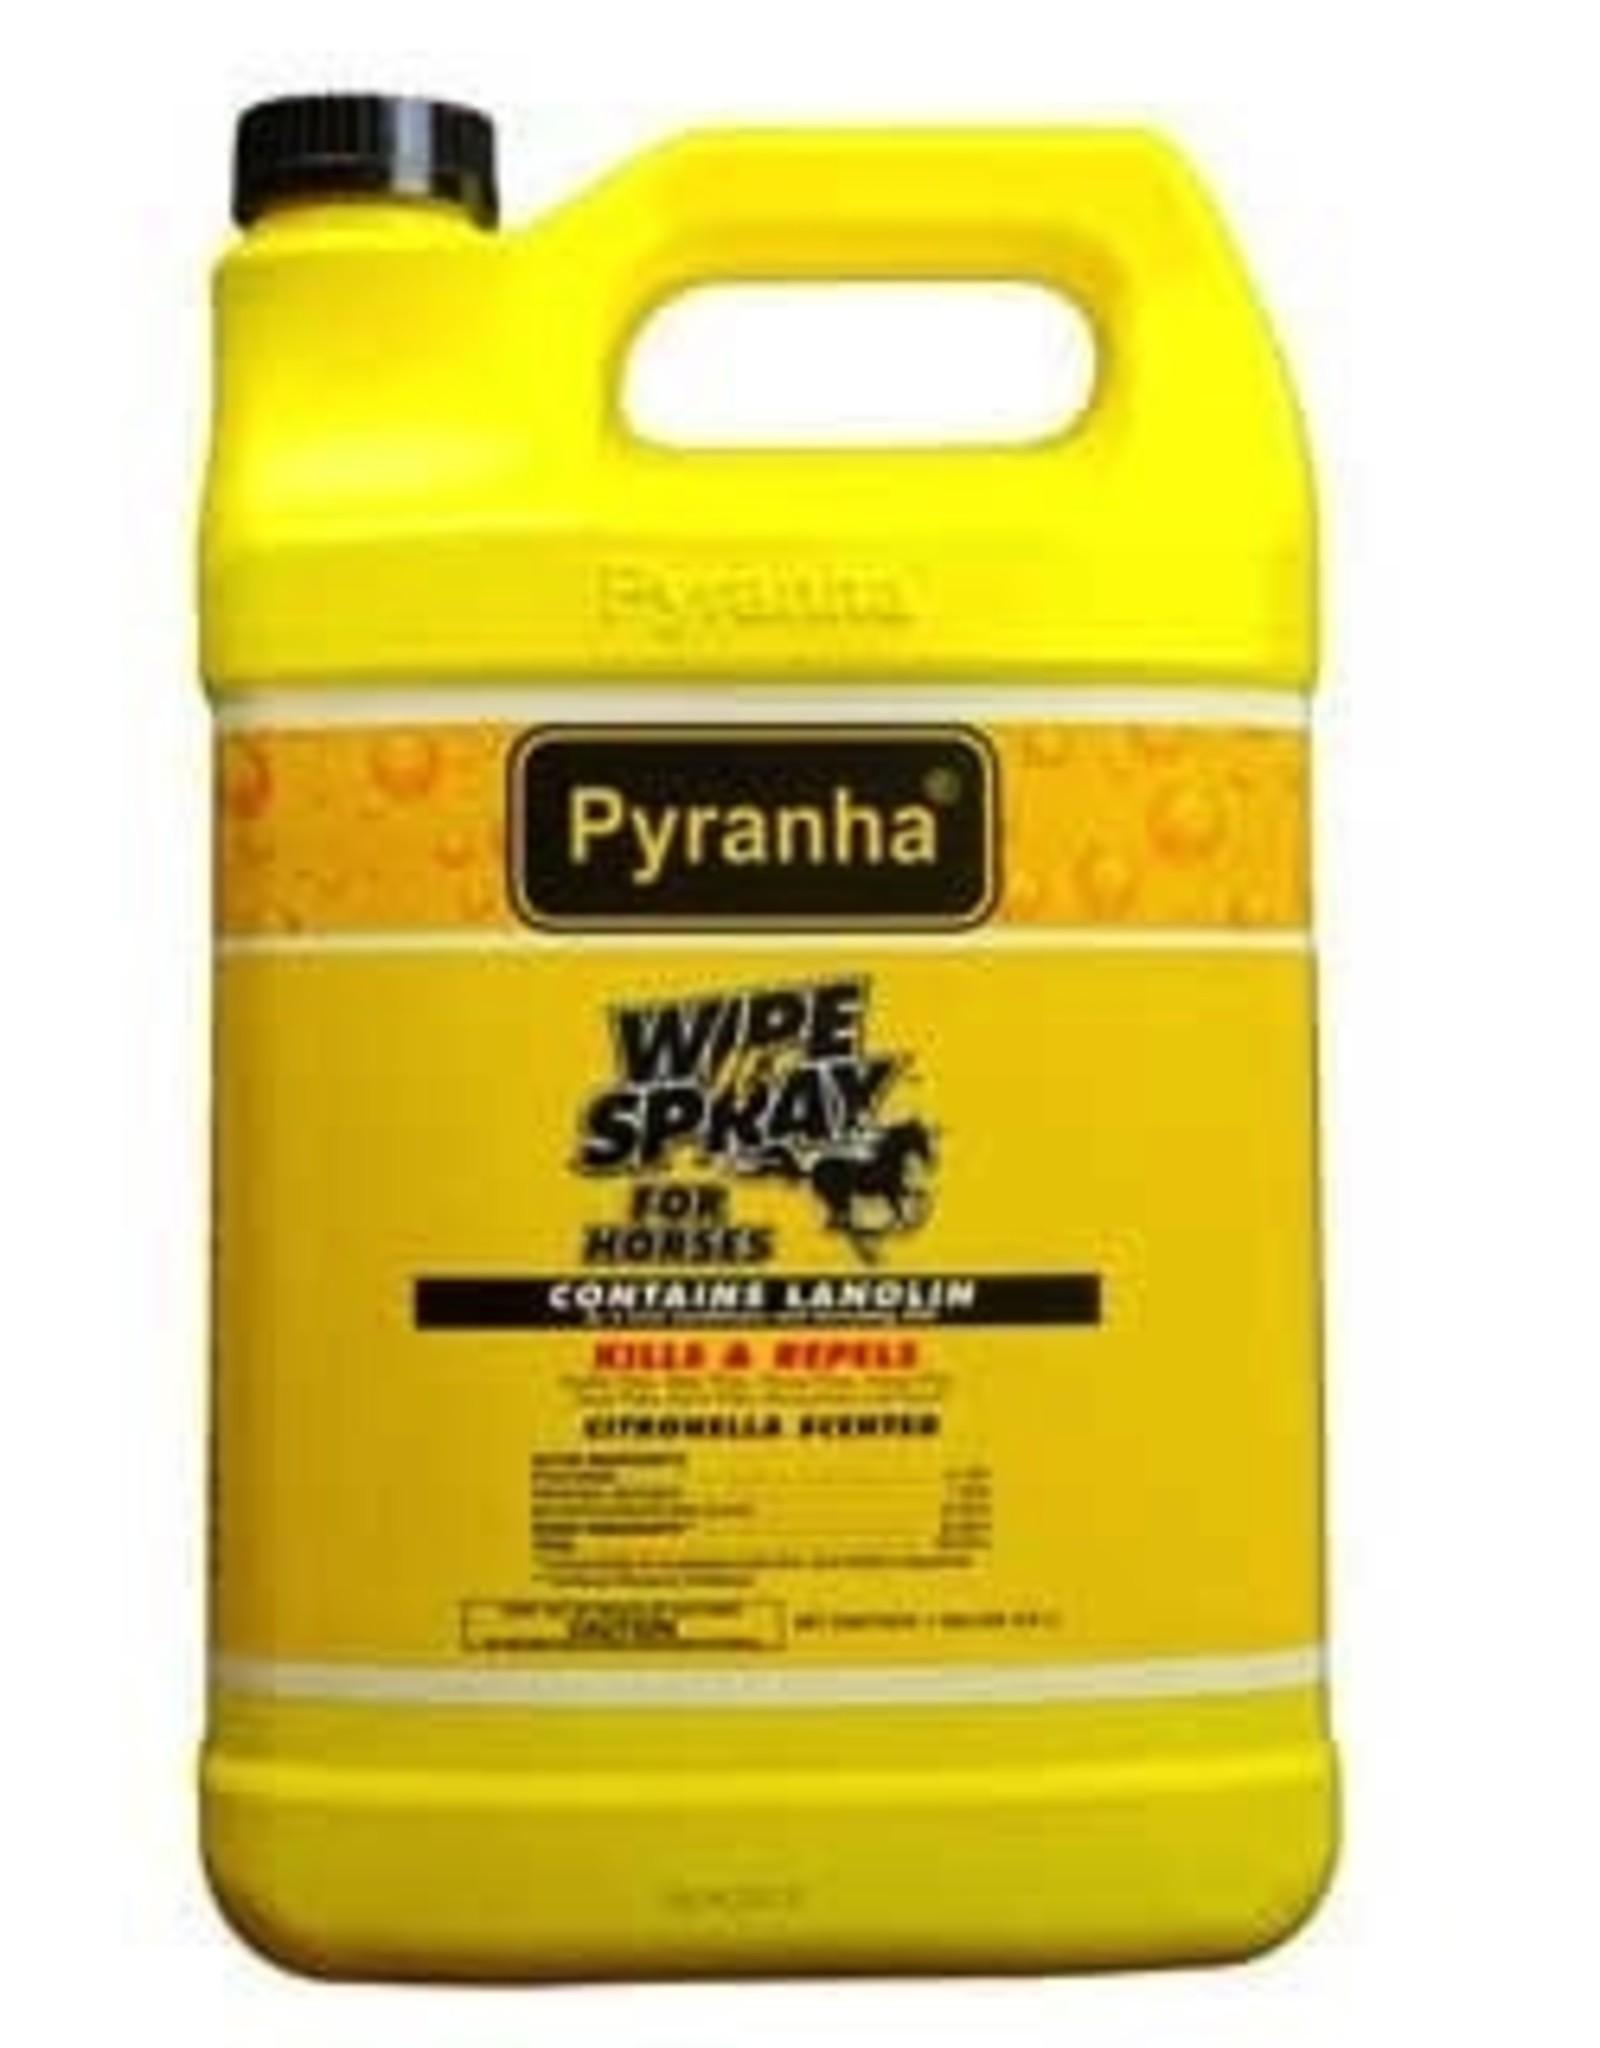 Pyranha Wipe N Spray Fly Repellent - Gallon